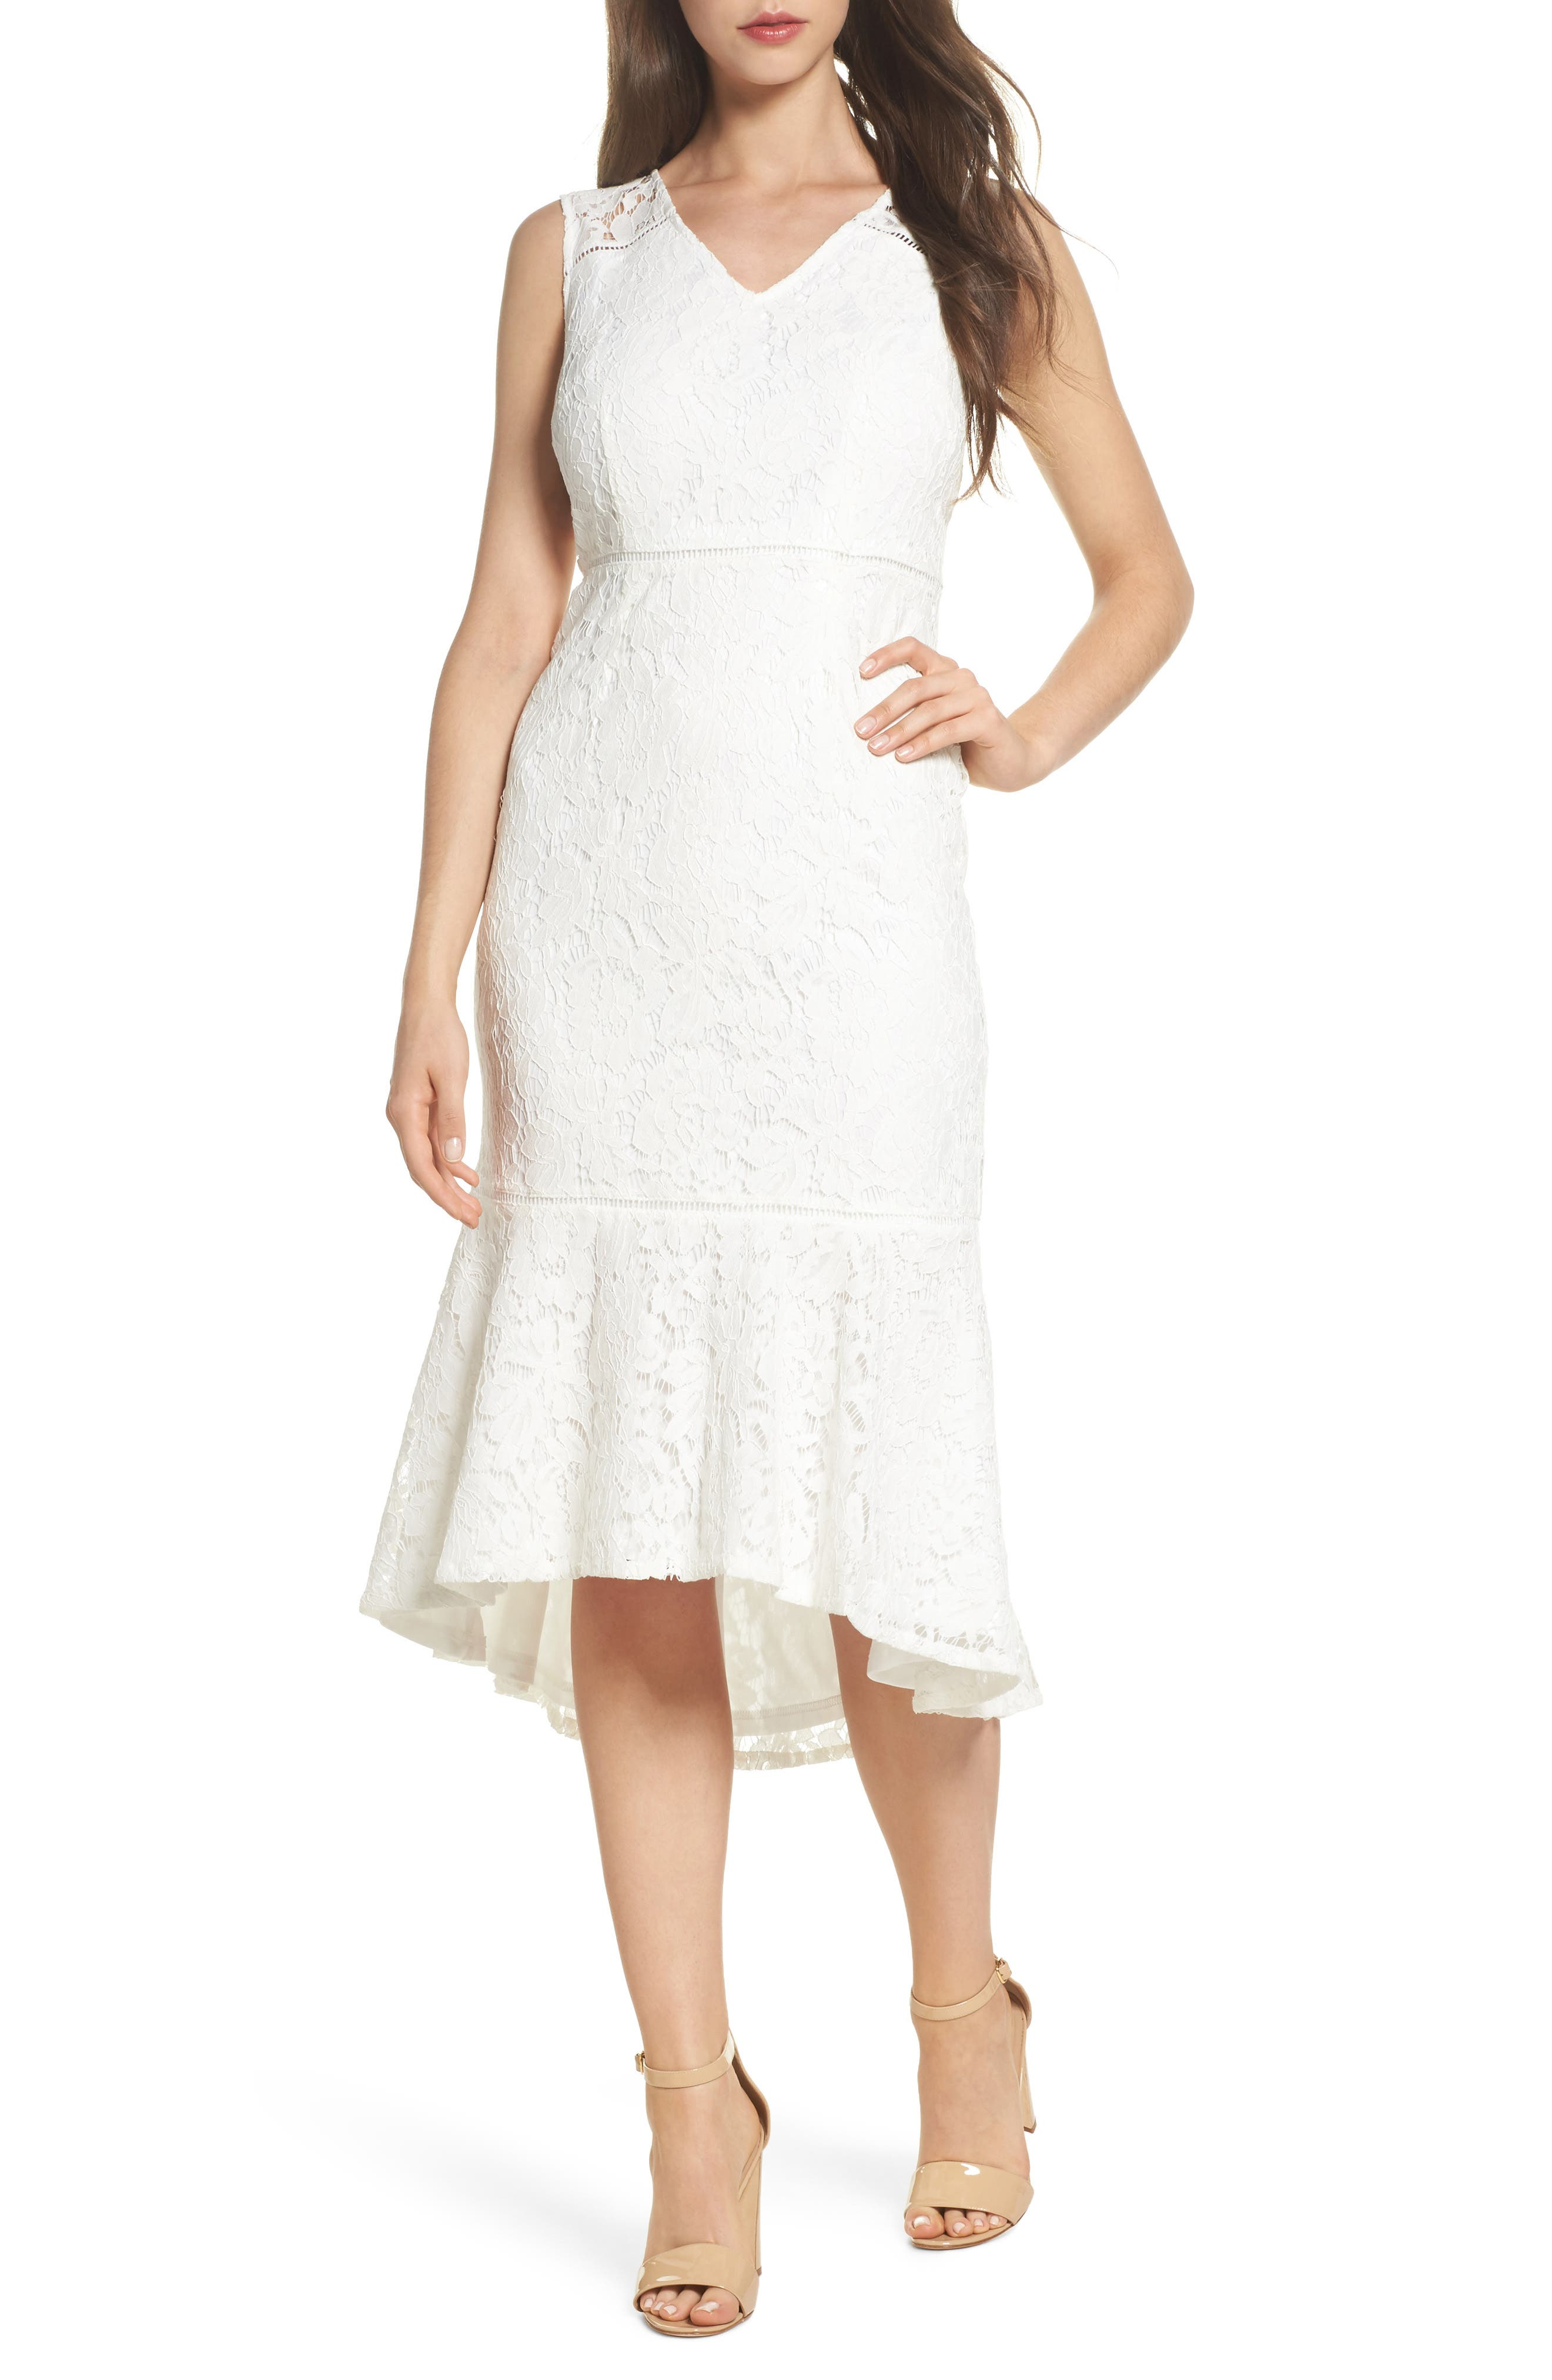 Adrianna Papell Cynthia Lace Flounce Hem Sheath Dress